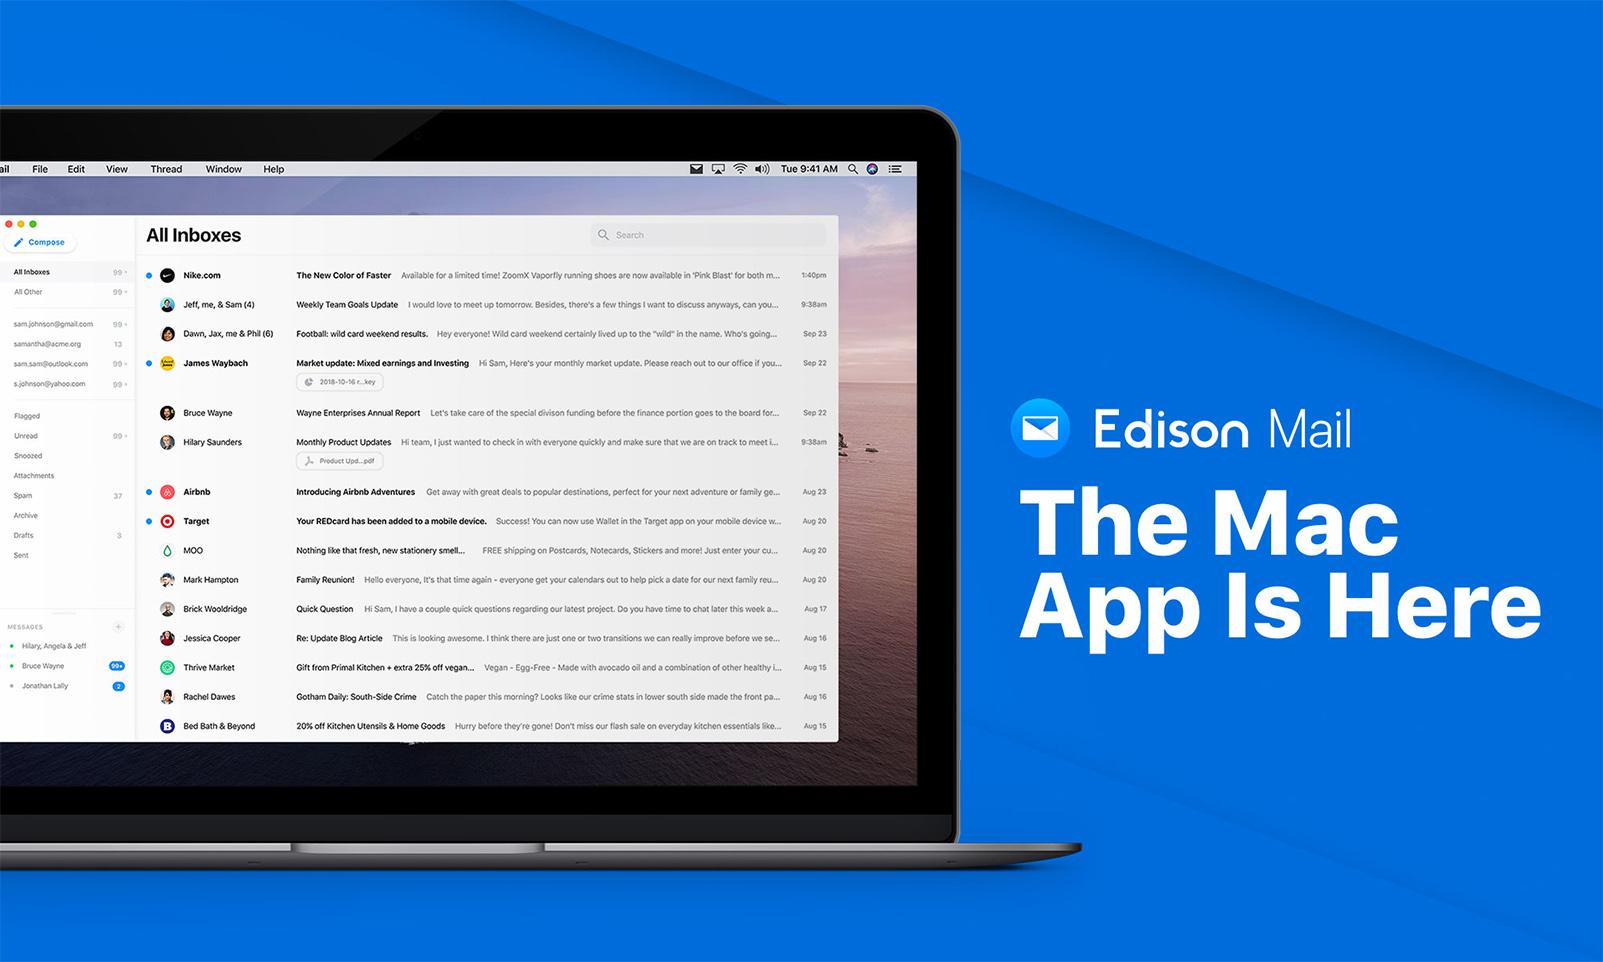 Edison Mail Mac app